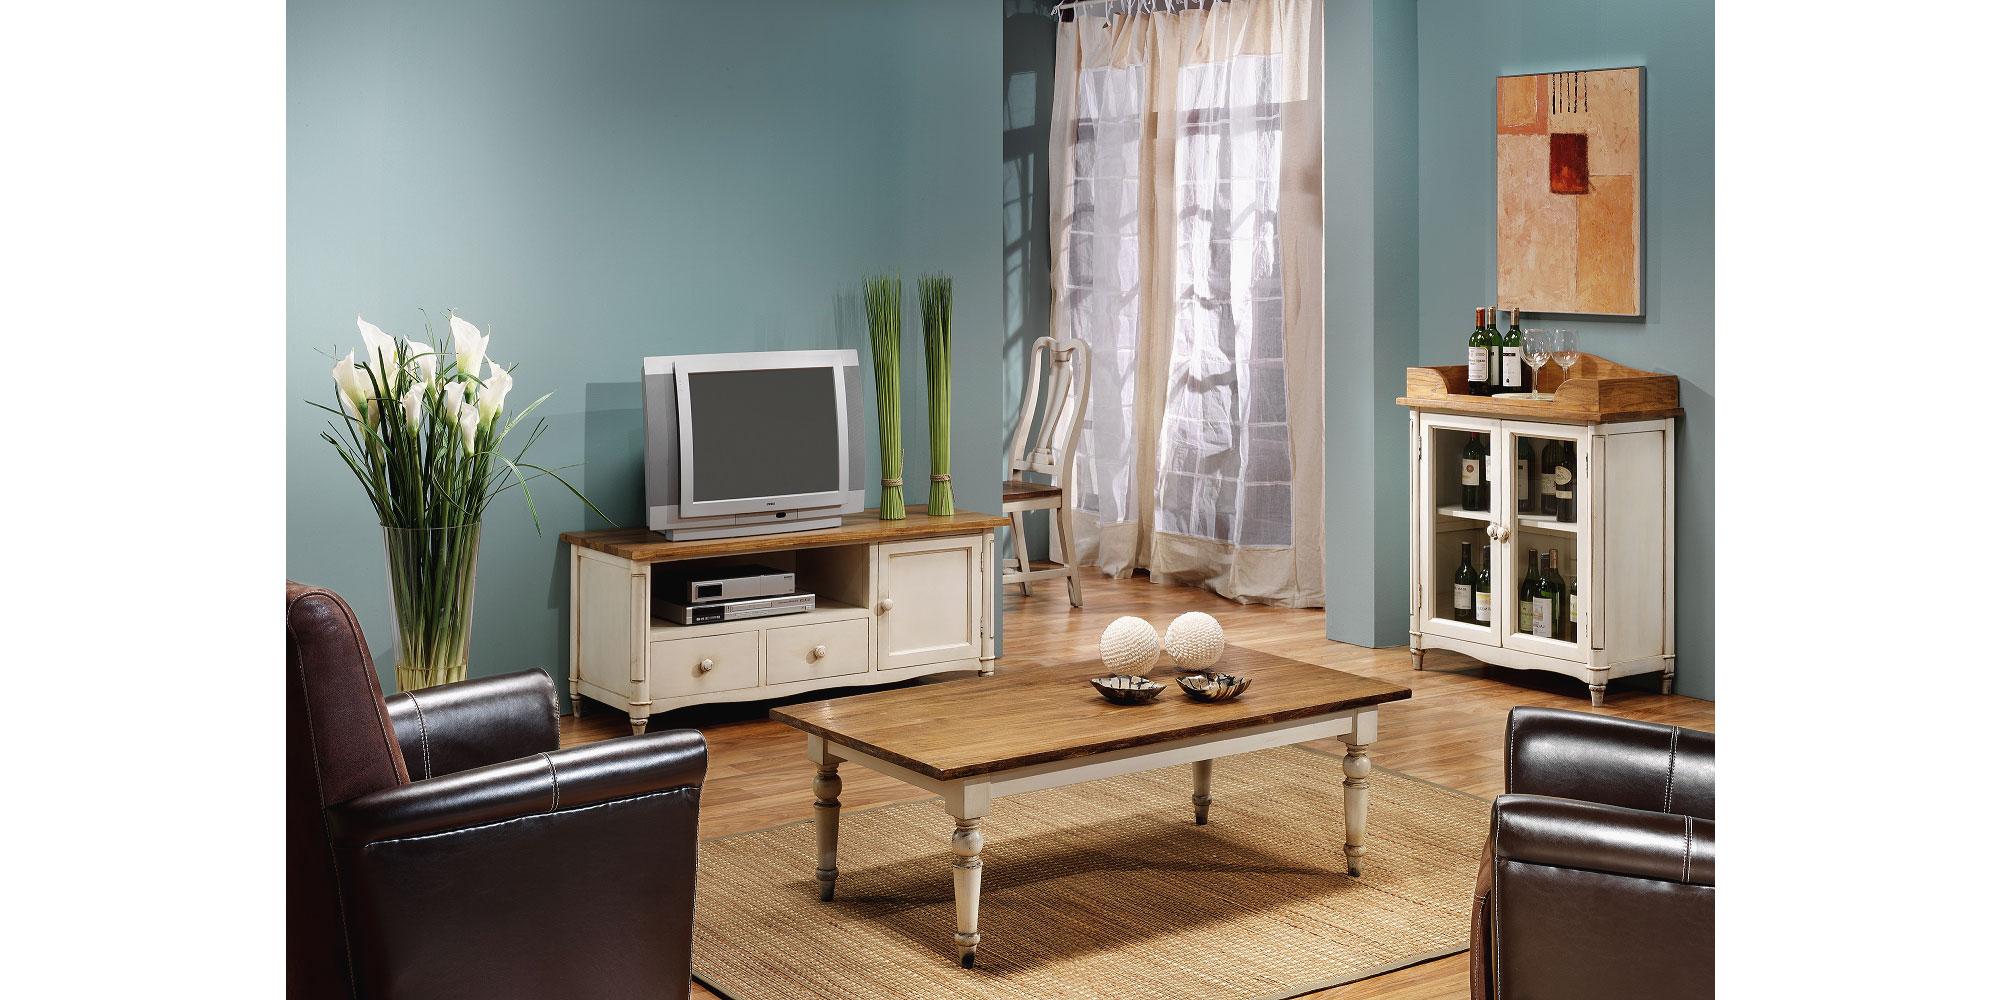 Muebles De Salon Vintage Drdp Salà N Vintage Montpellier En Portobellostreet